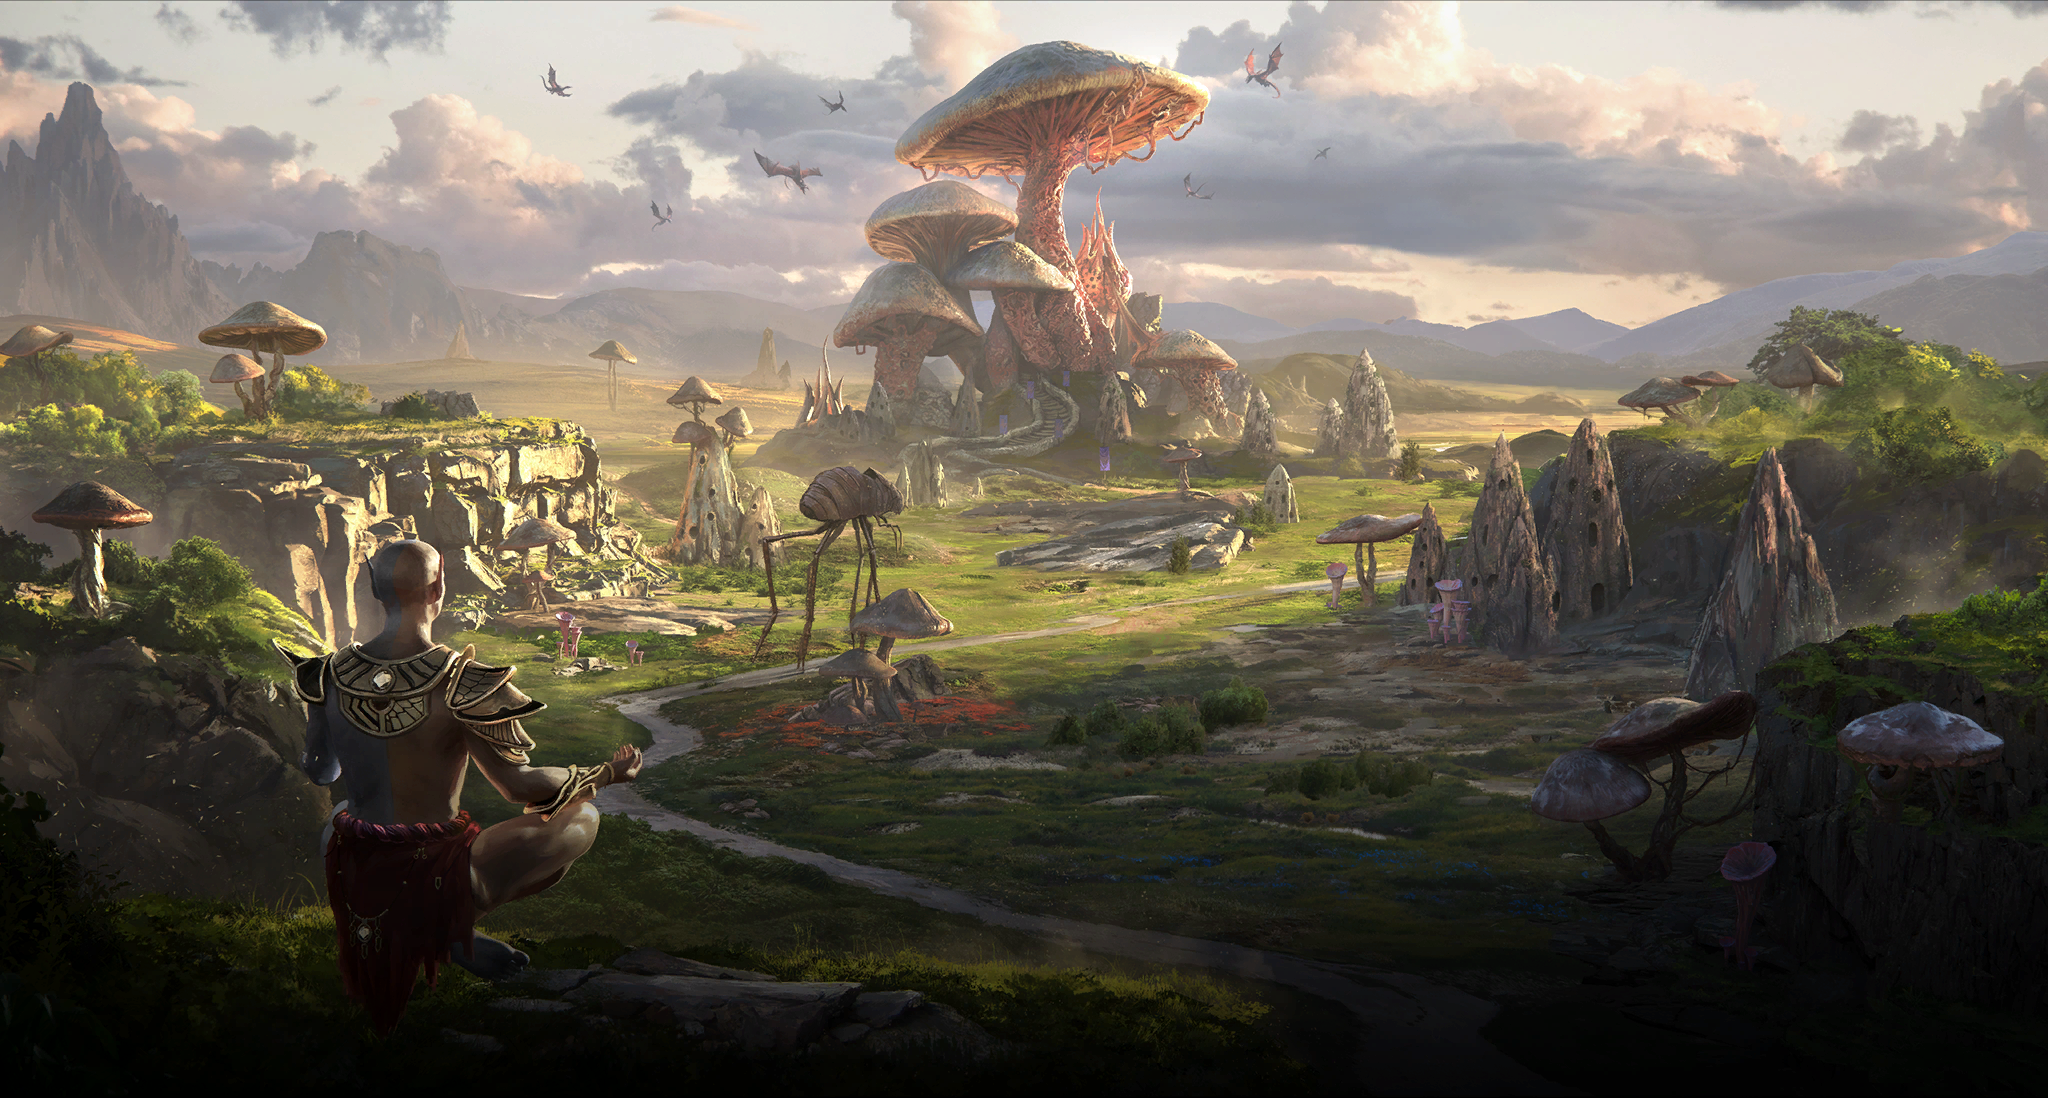 Houses of Morrowind